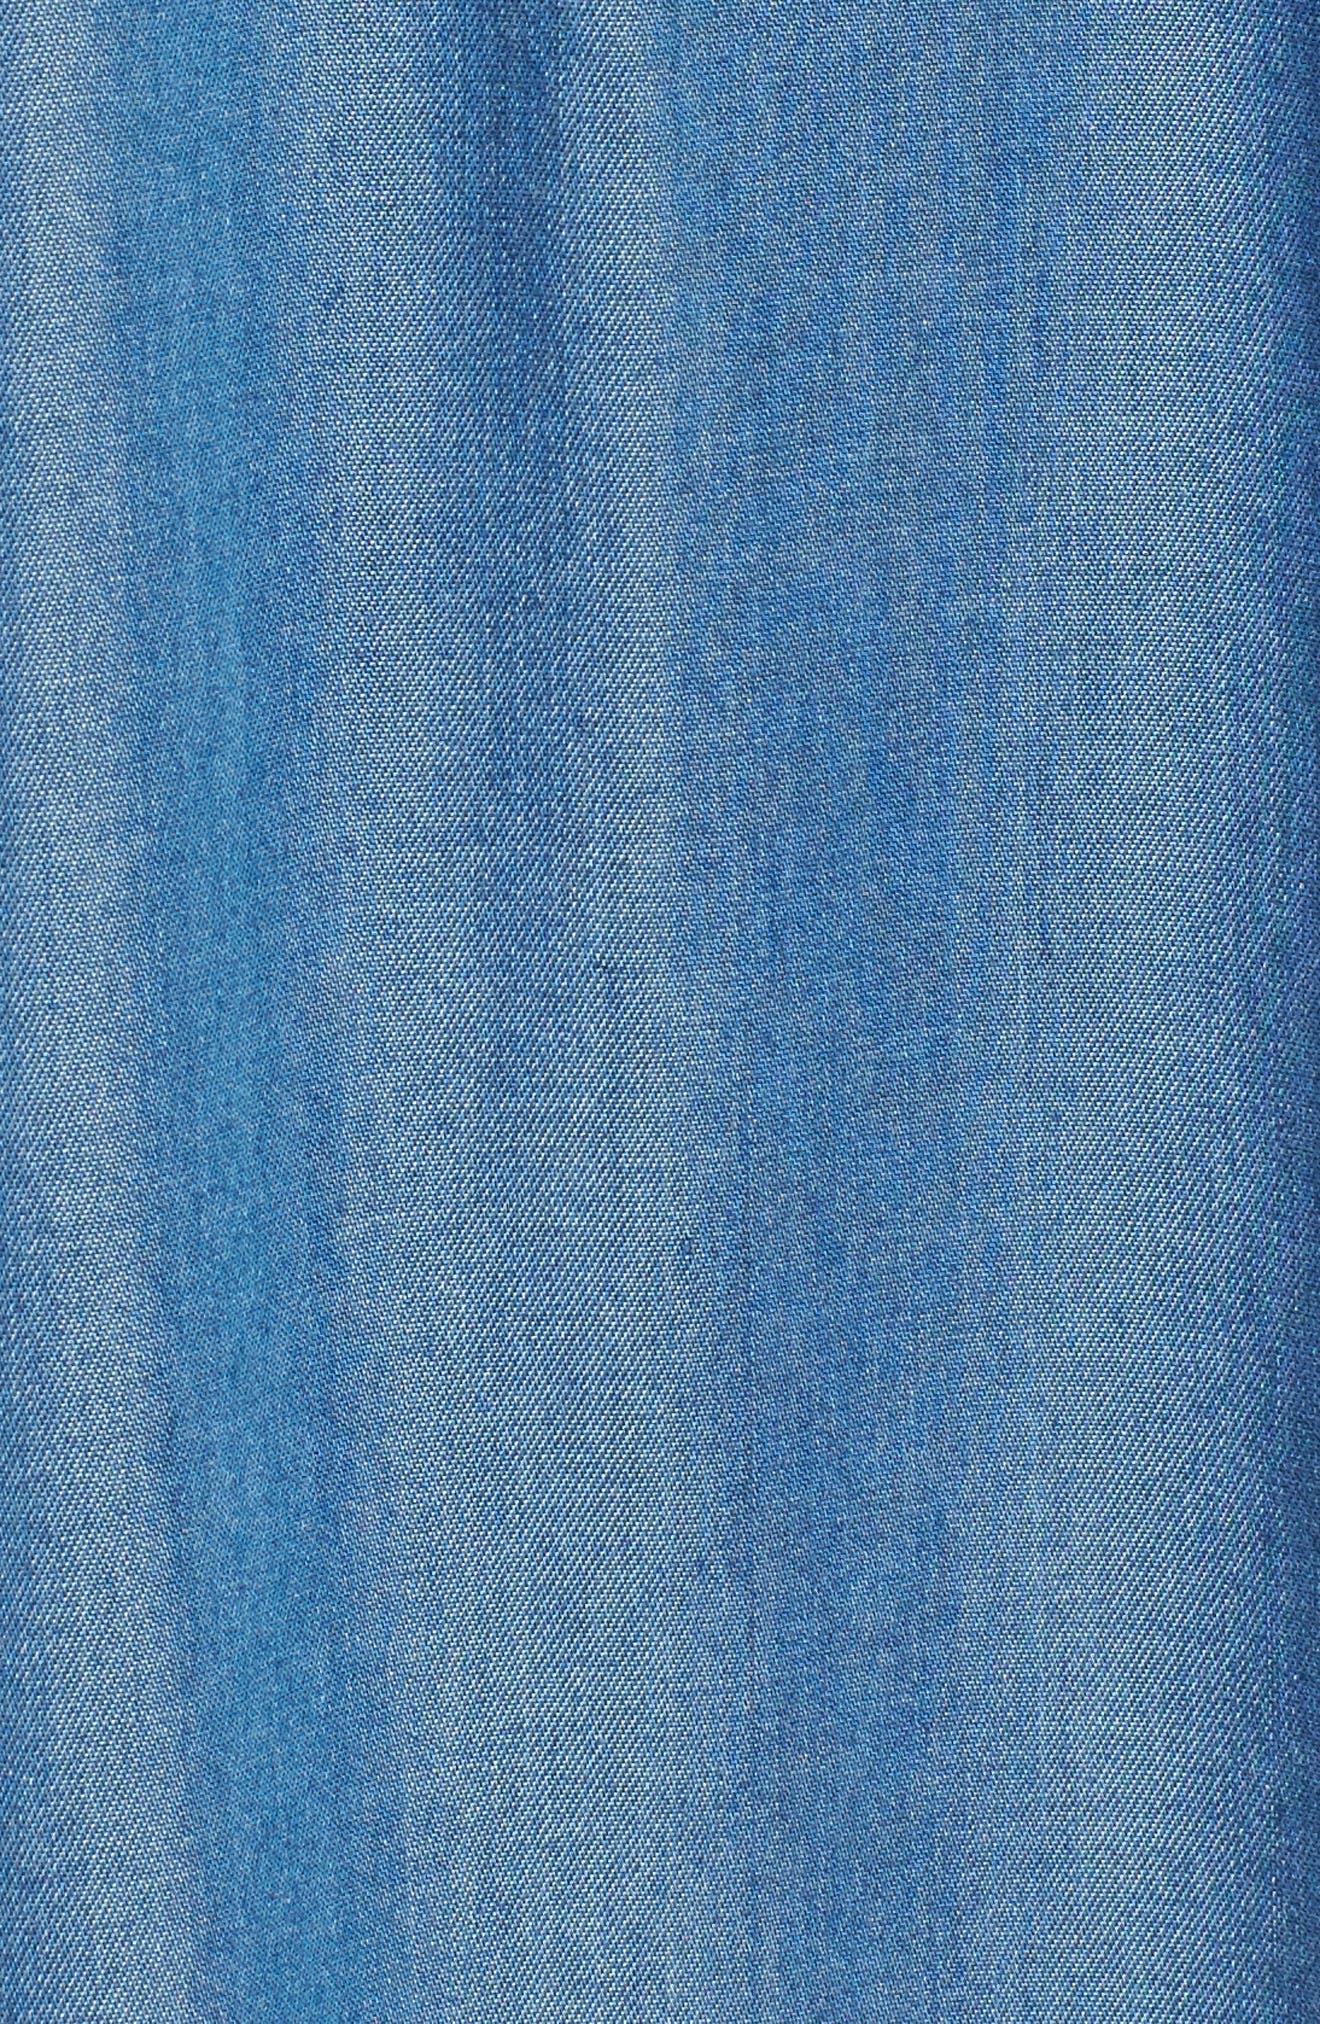 Off the Shoulder Midi Dress,                             Alternate thumbnail 5, color,                             401